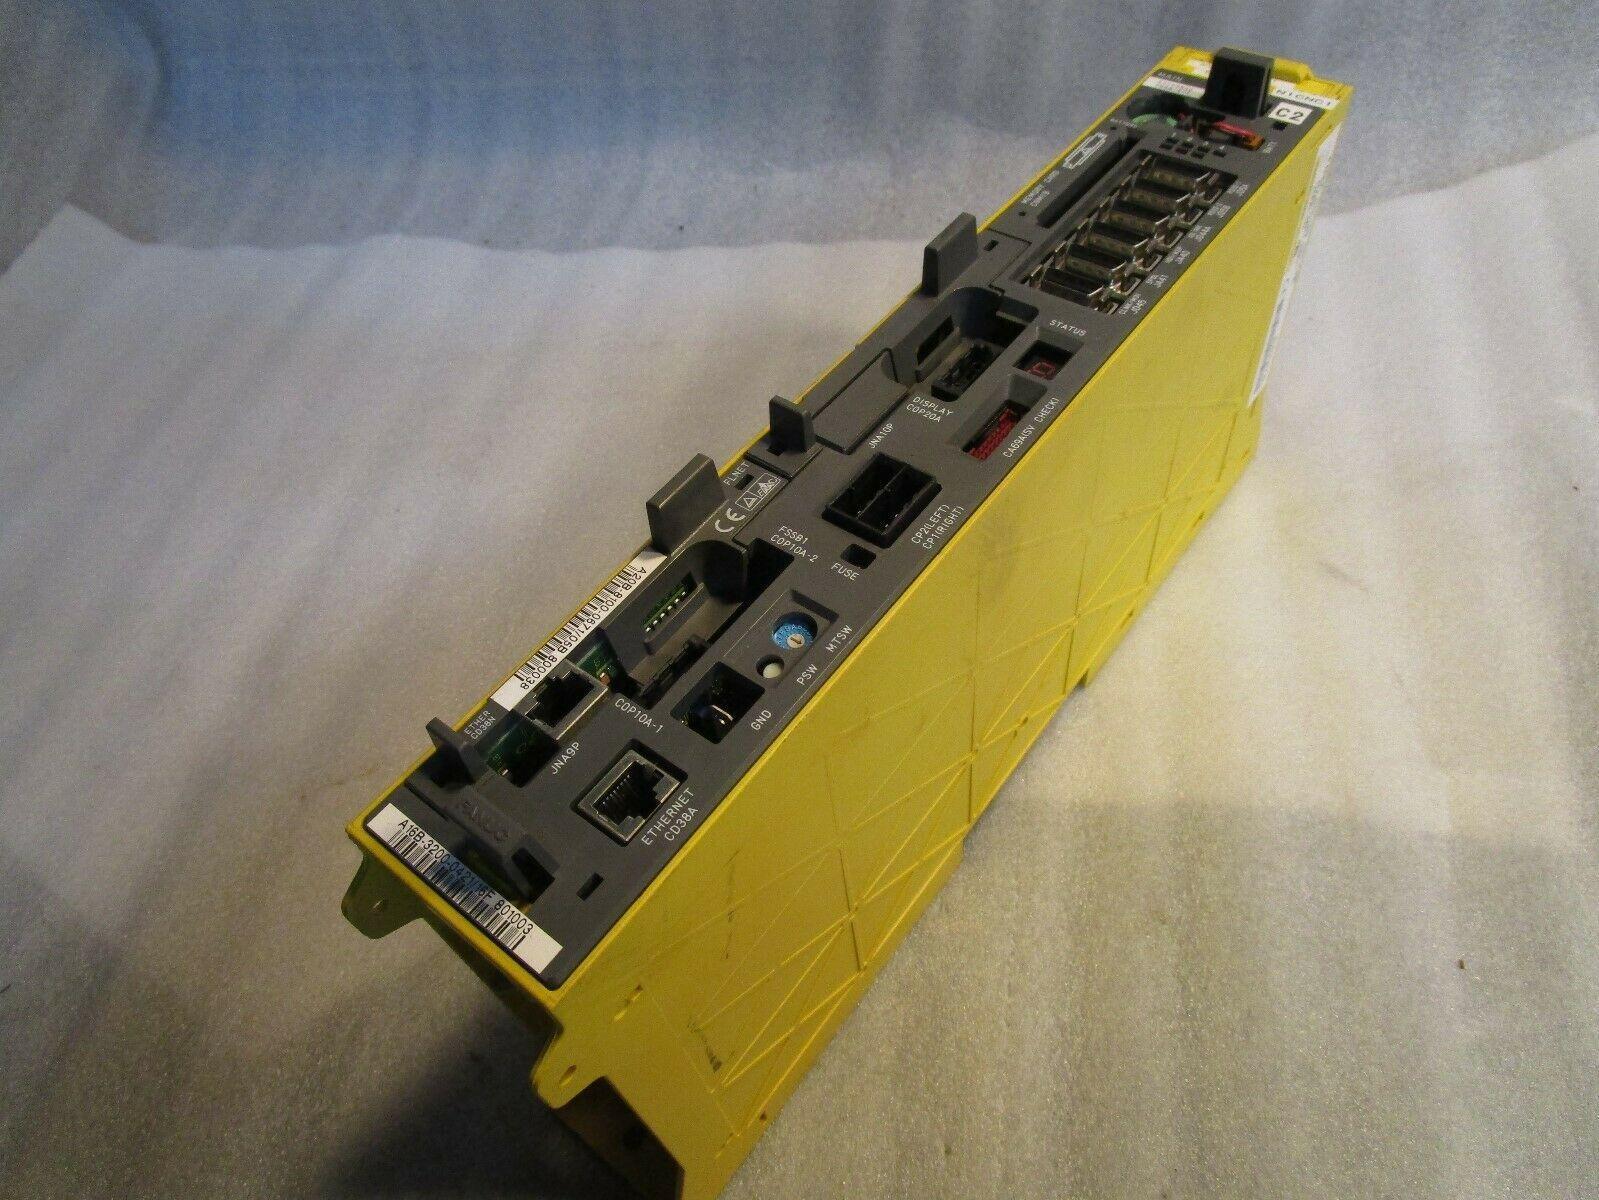 Fanuc 18i LNB CNC Control A02B-0283-B801, A16B-3200-0421/16F, 802555